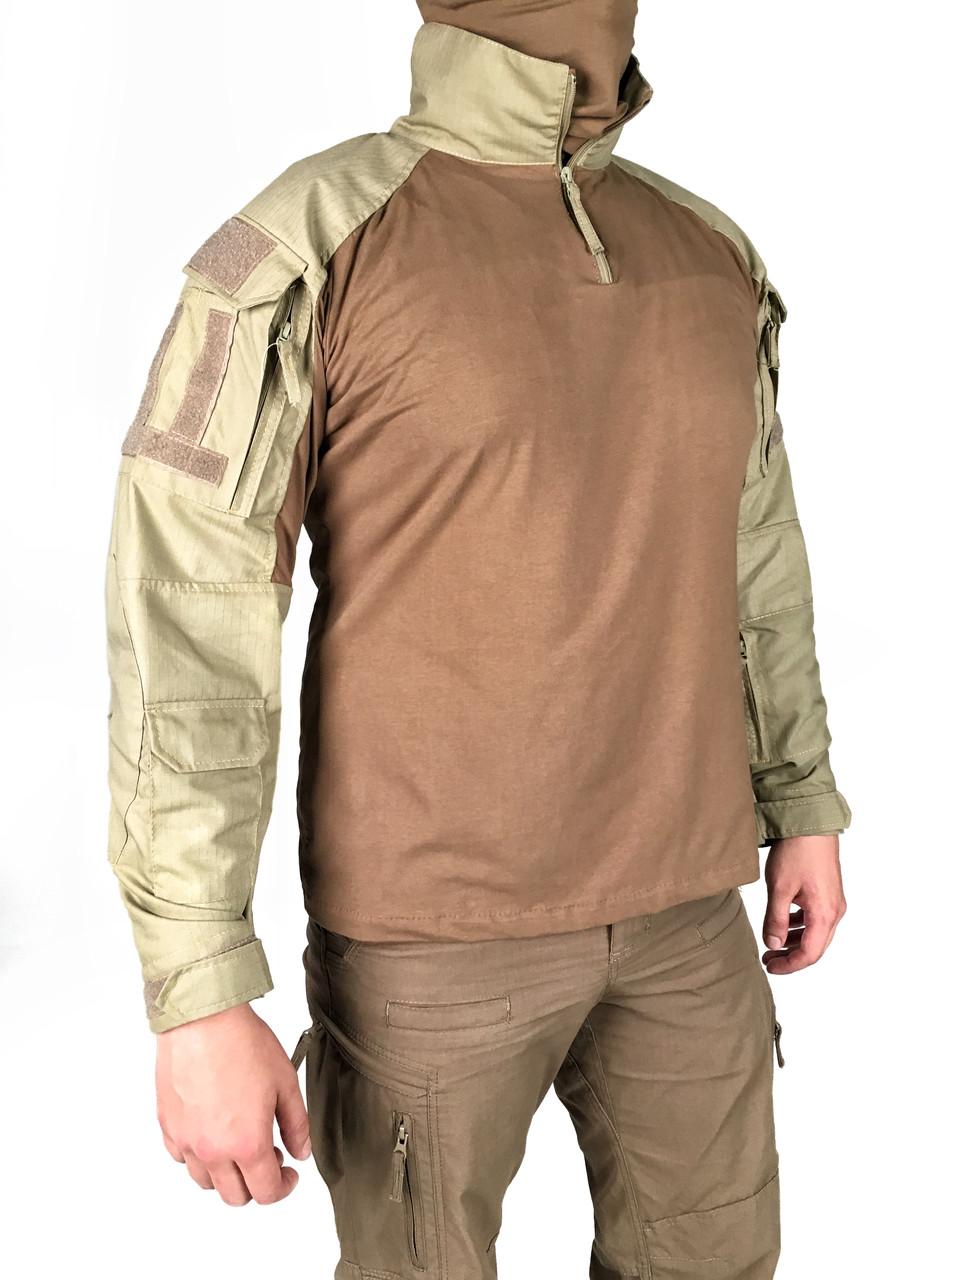 Боевая рубашка койот